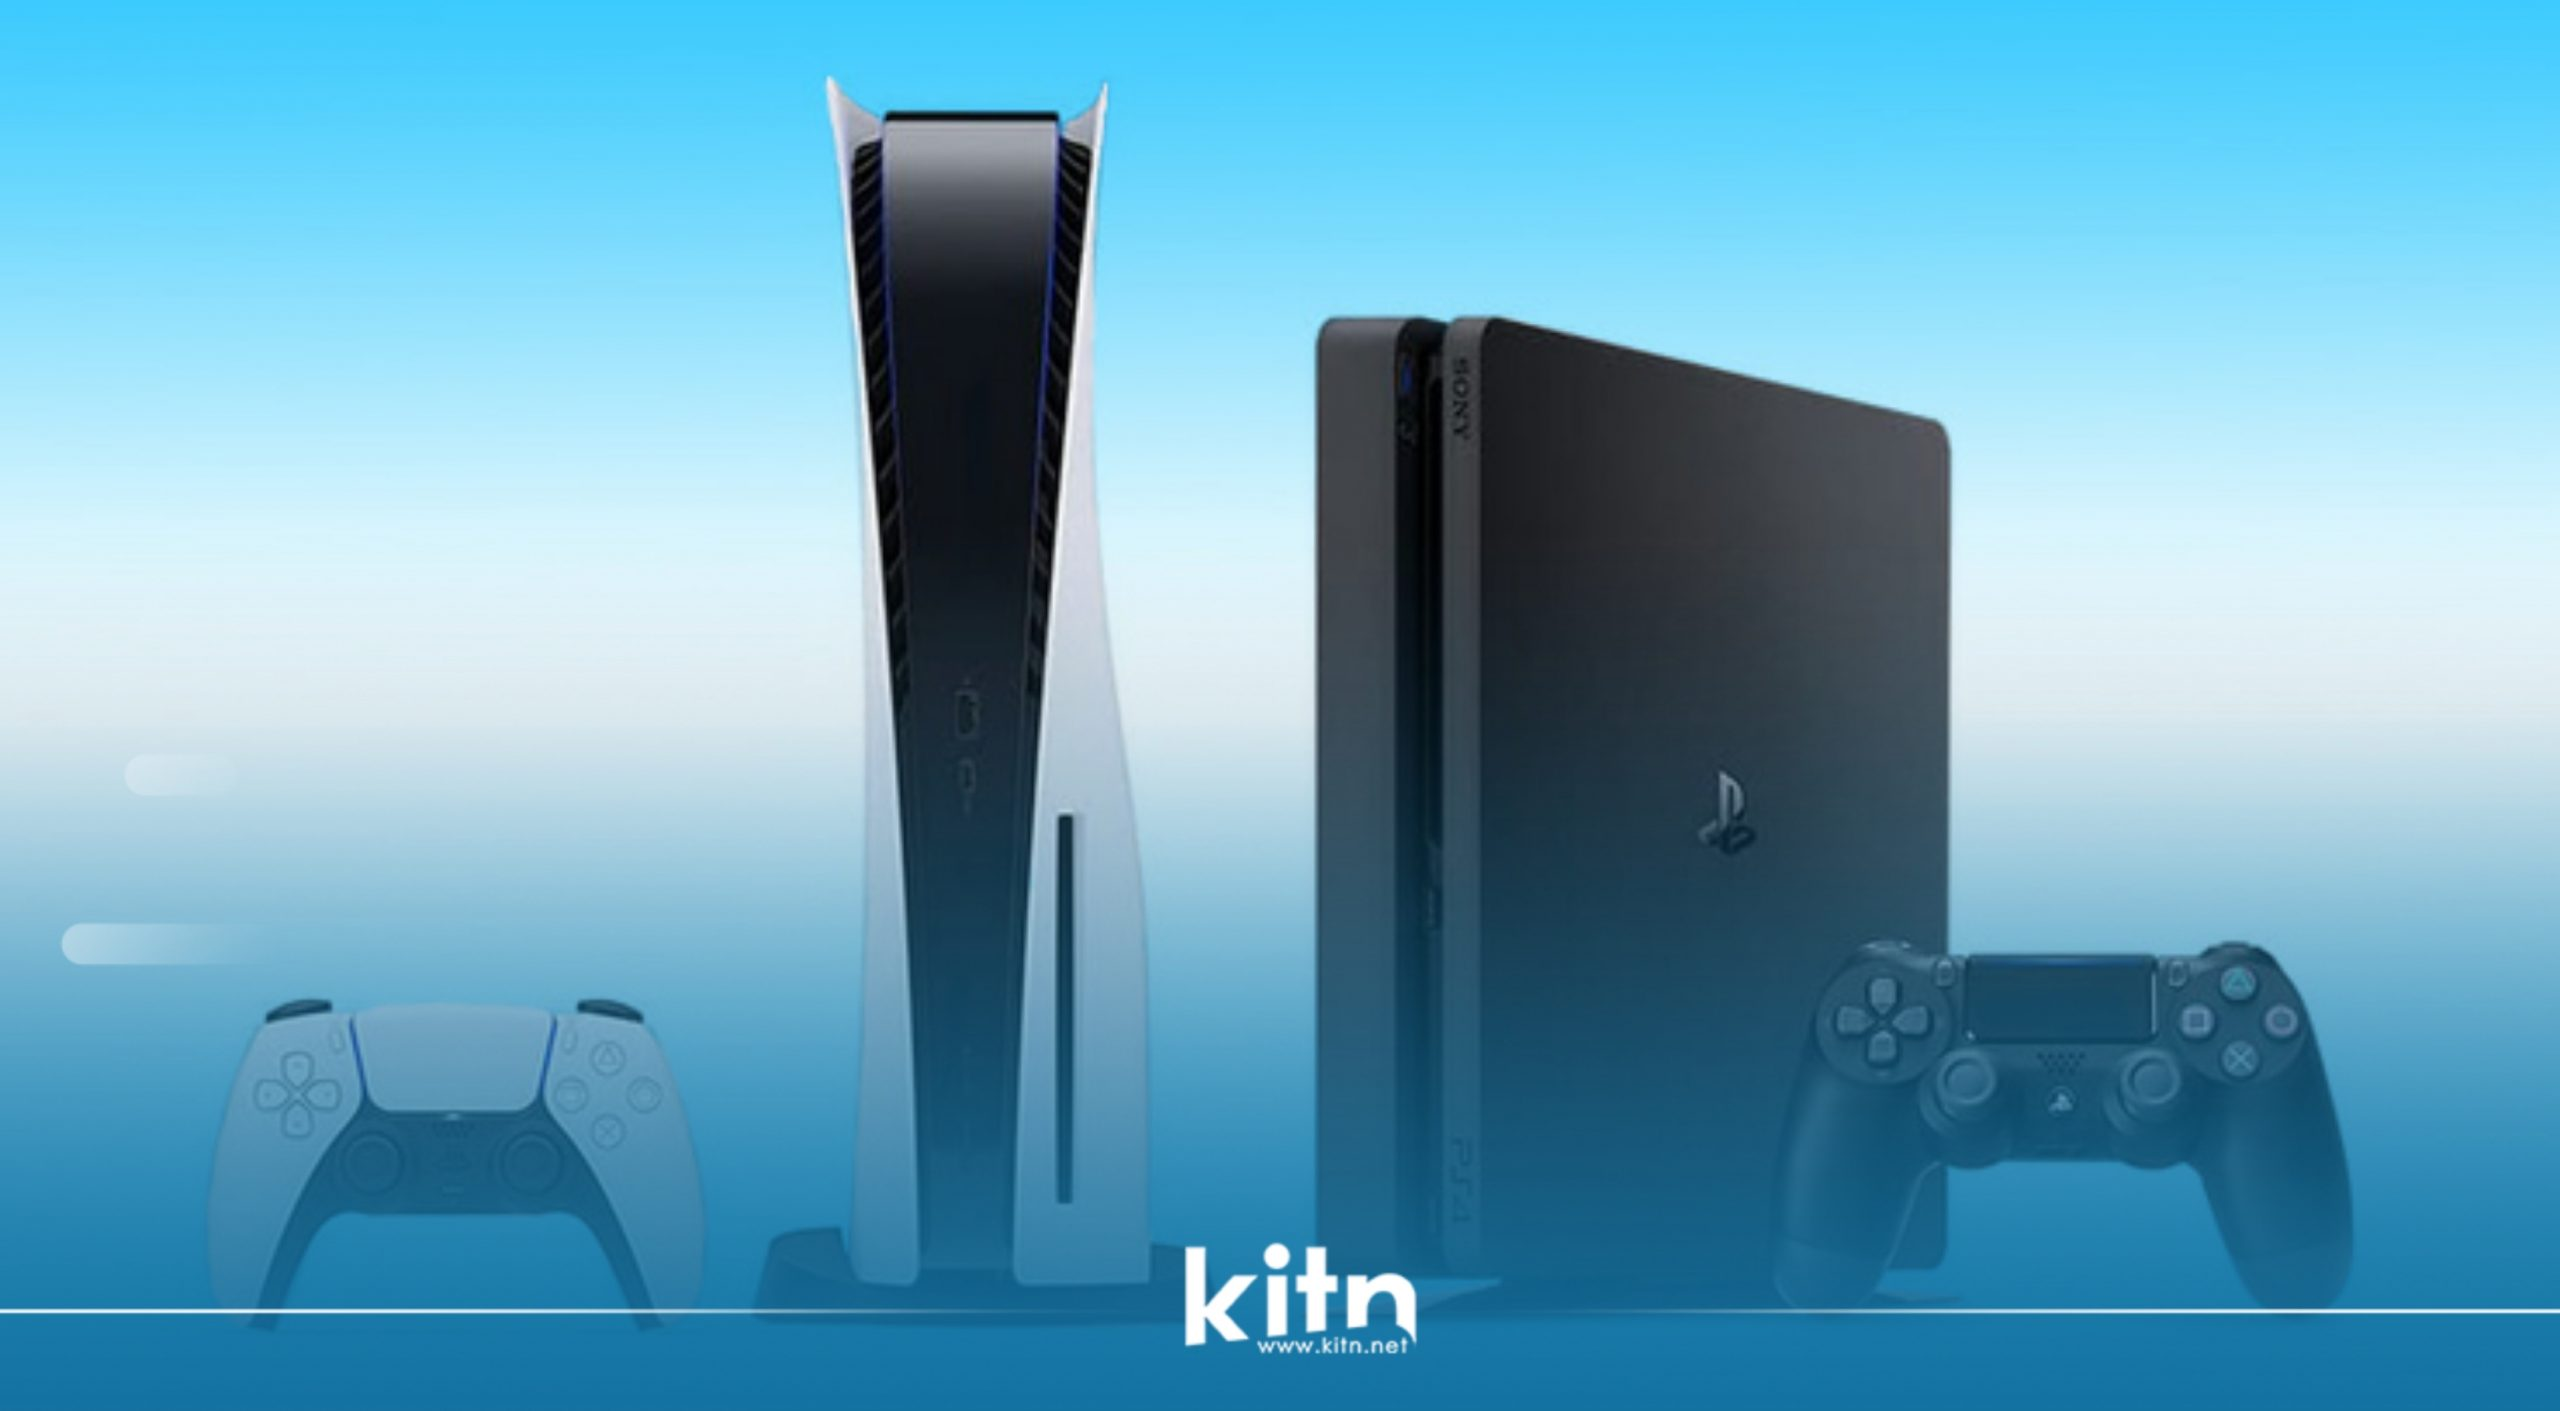 بە فەرمی سۆنی زانیاری زیاتری لەبارەی Backward Compatibility و ئەو یارییانەی PS4 کە بۆ PS5 ناگونجێن بڵاو کردەوە